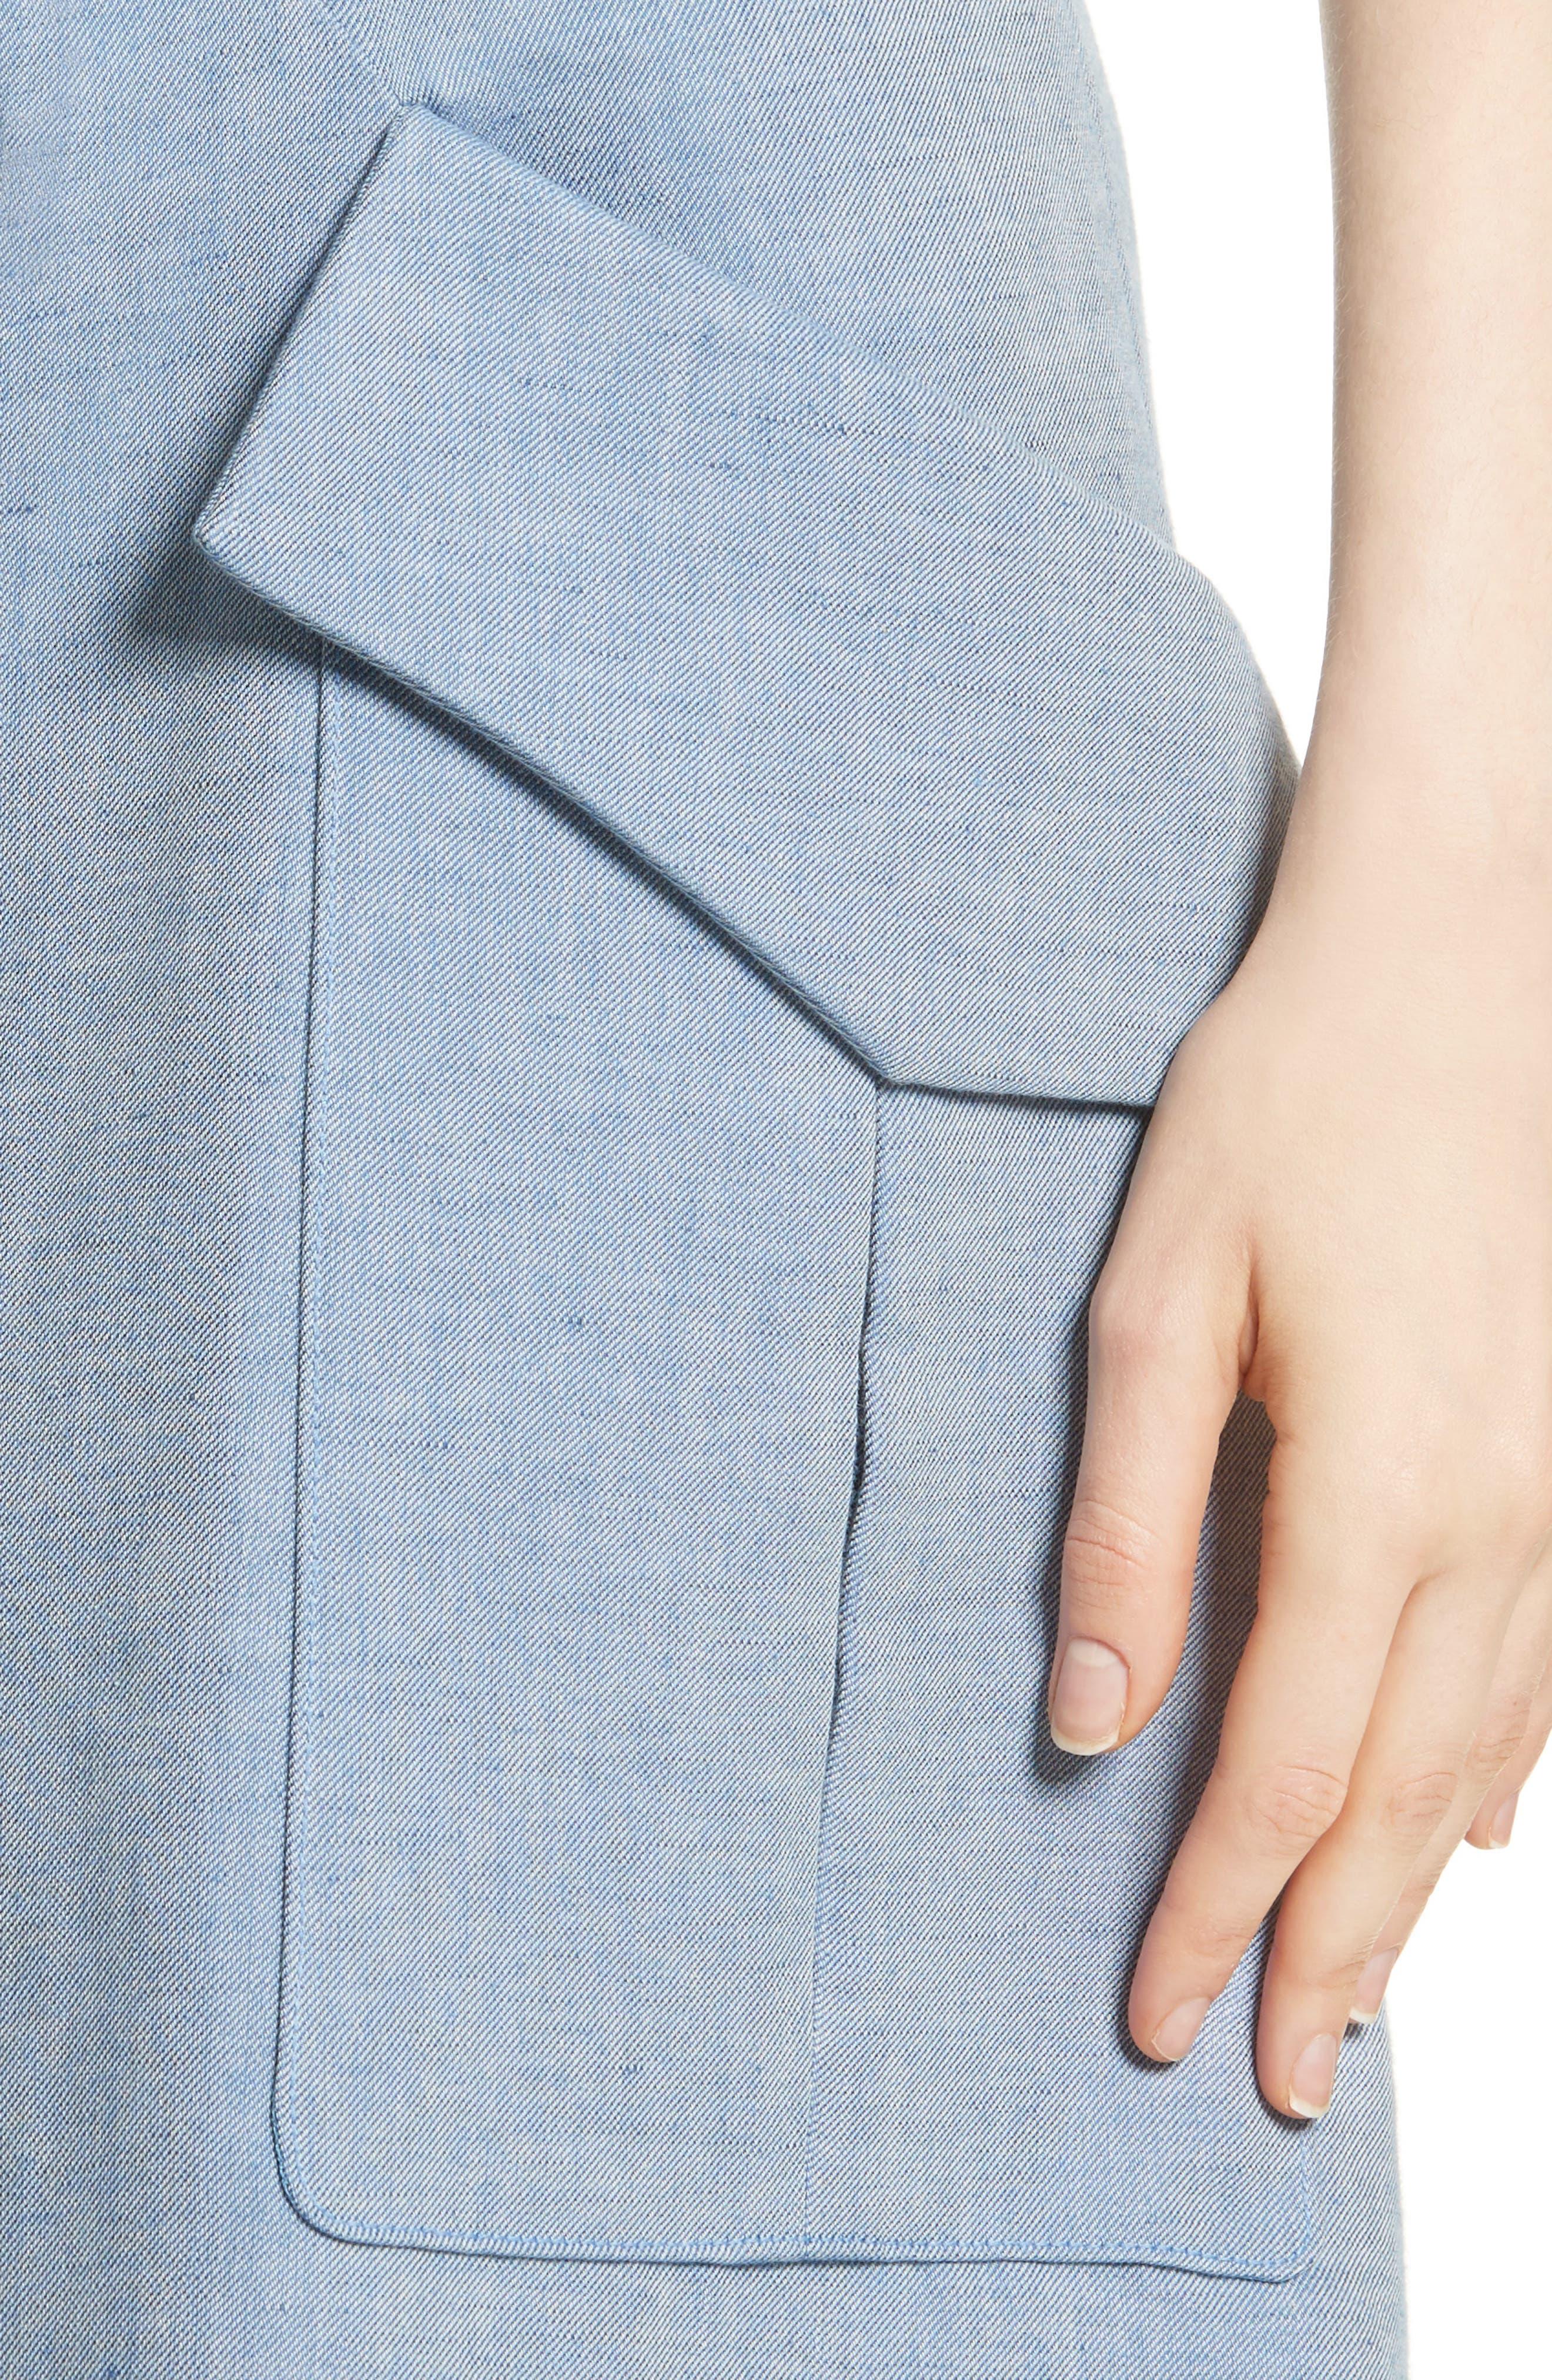 Jupe Genou Skirt,                             Alternate thumbnail 4, color,                             400